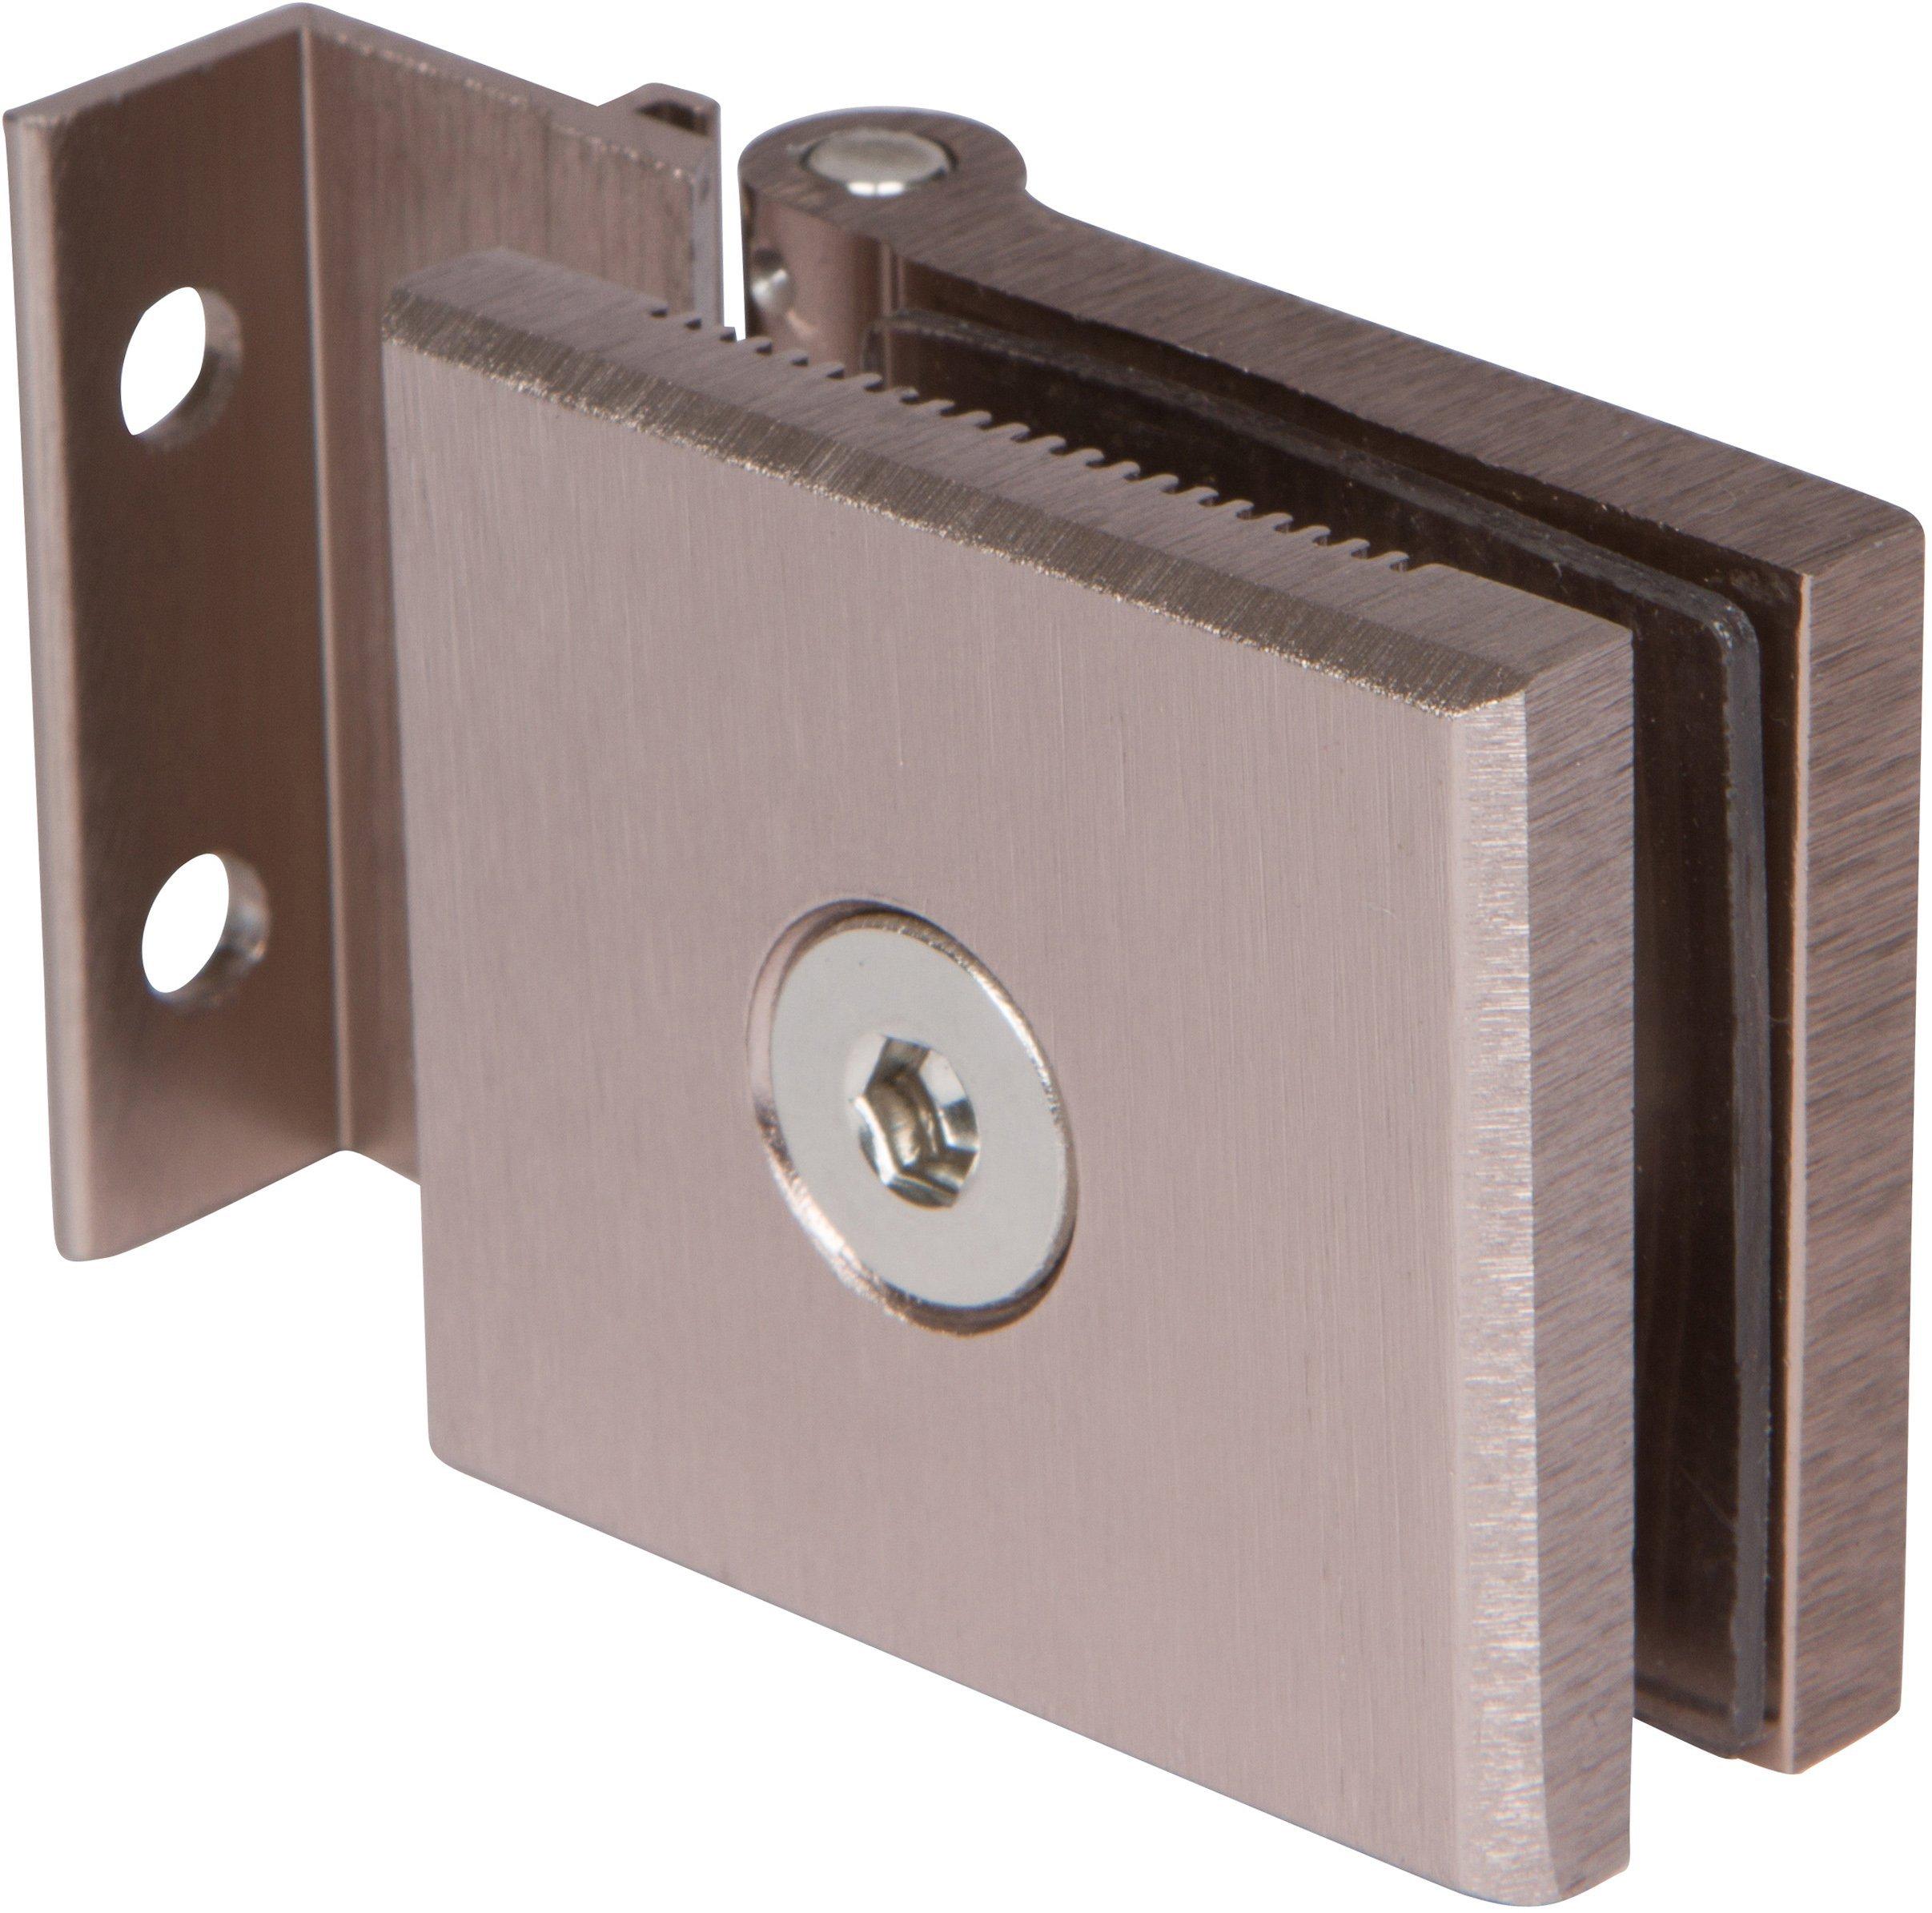 "Mini Hinge for 1/4"" Glass Shower Doors in Brushed Nickel Finish,"